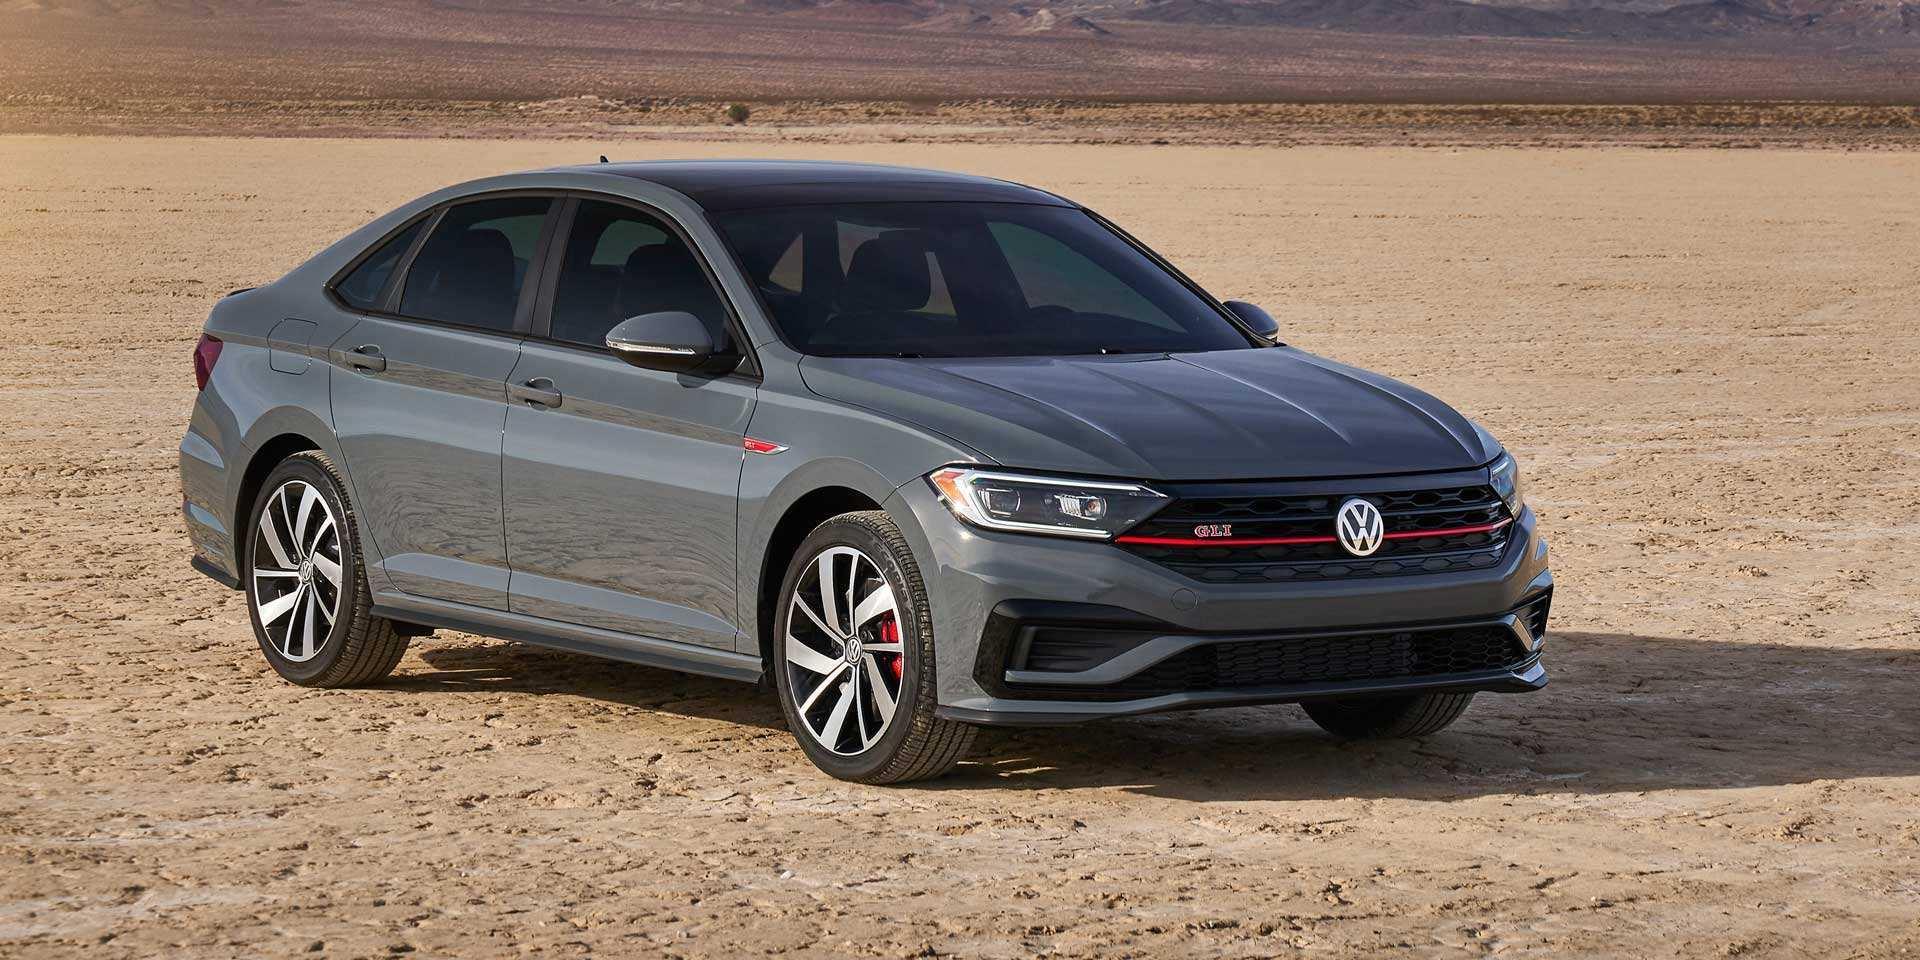 90 Best Review New Volkswagen Jetta Gli 2019 Redesign And Concept Rumors with New Volkswagen Jetta Gli 2019 Redesign And Concept